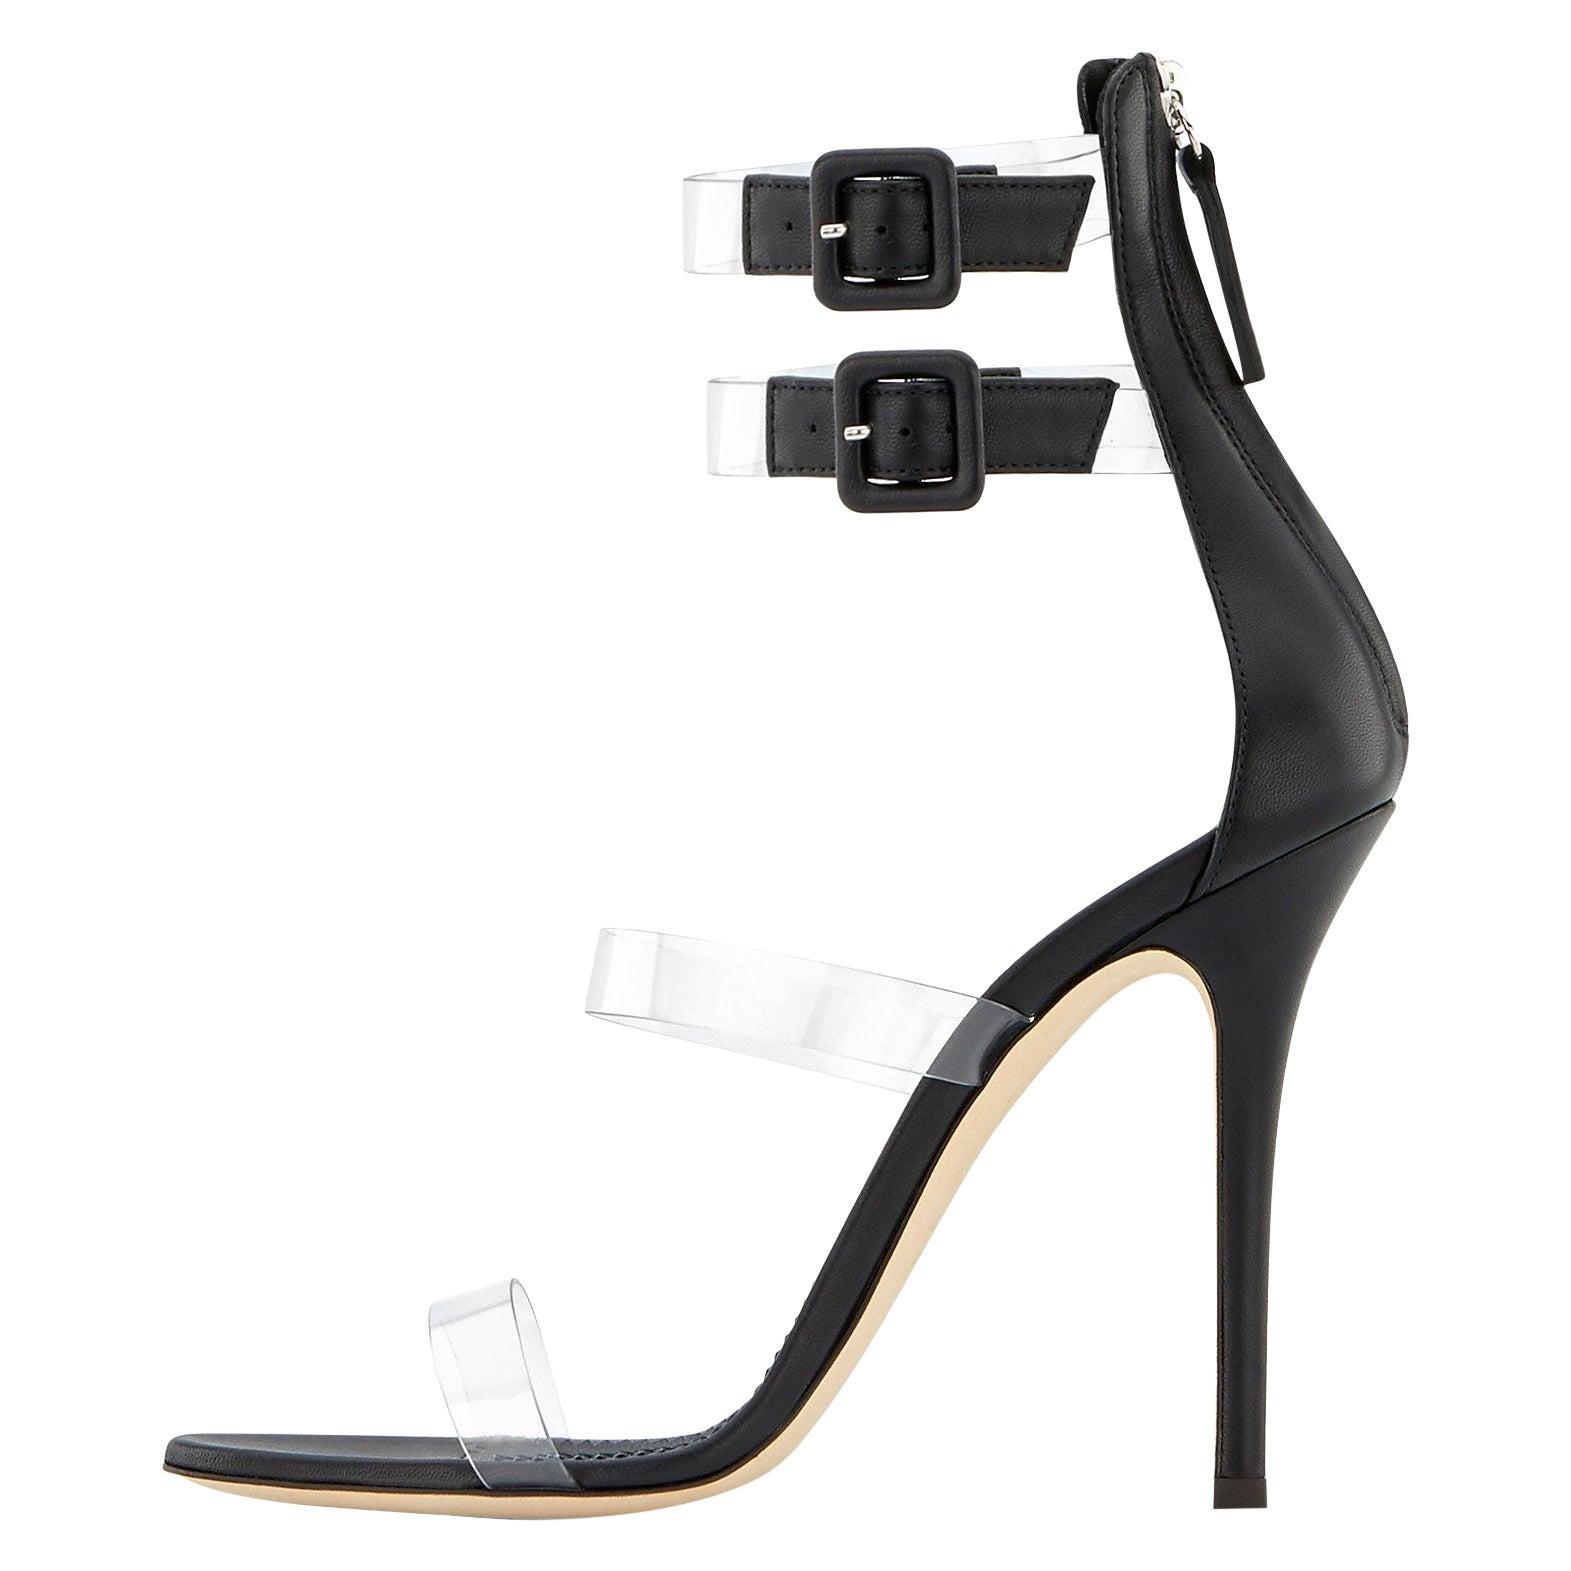 Giuseppe Zanotti NEW Black Leather Vinyl Evening Sandals Heels in Box (IT 41)